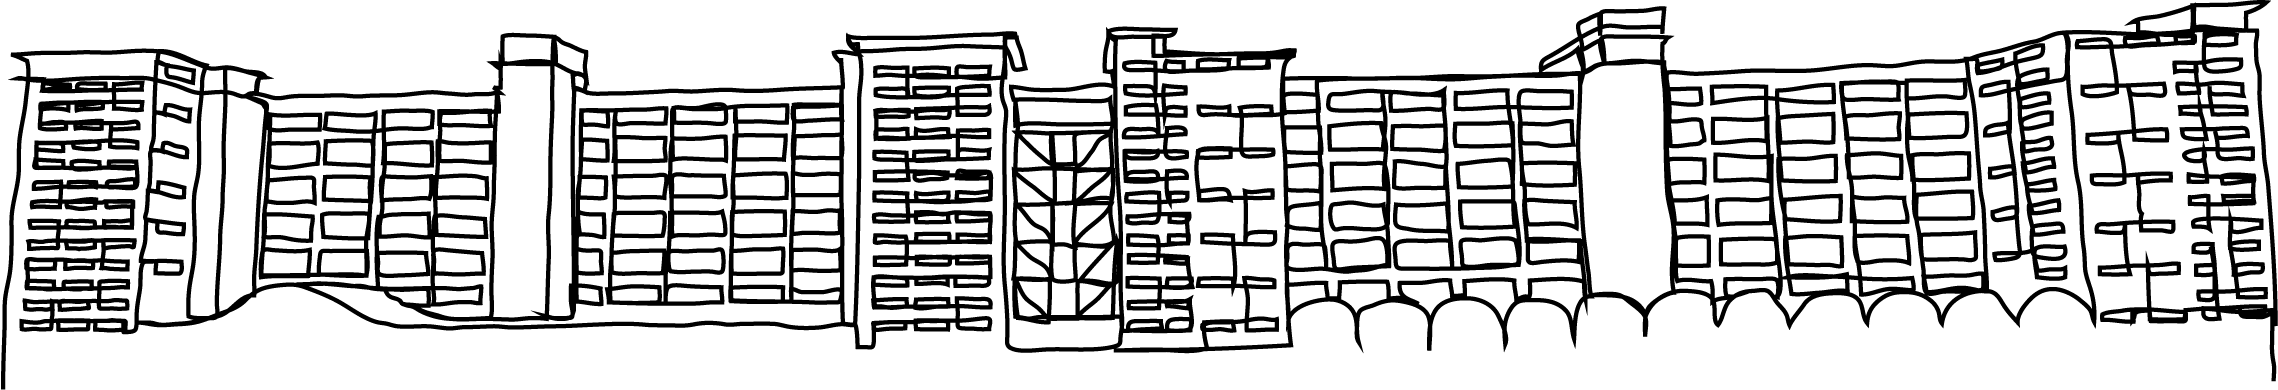 Loftbewoner-S